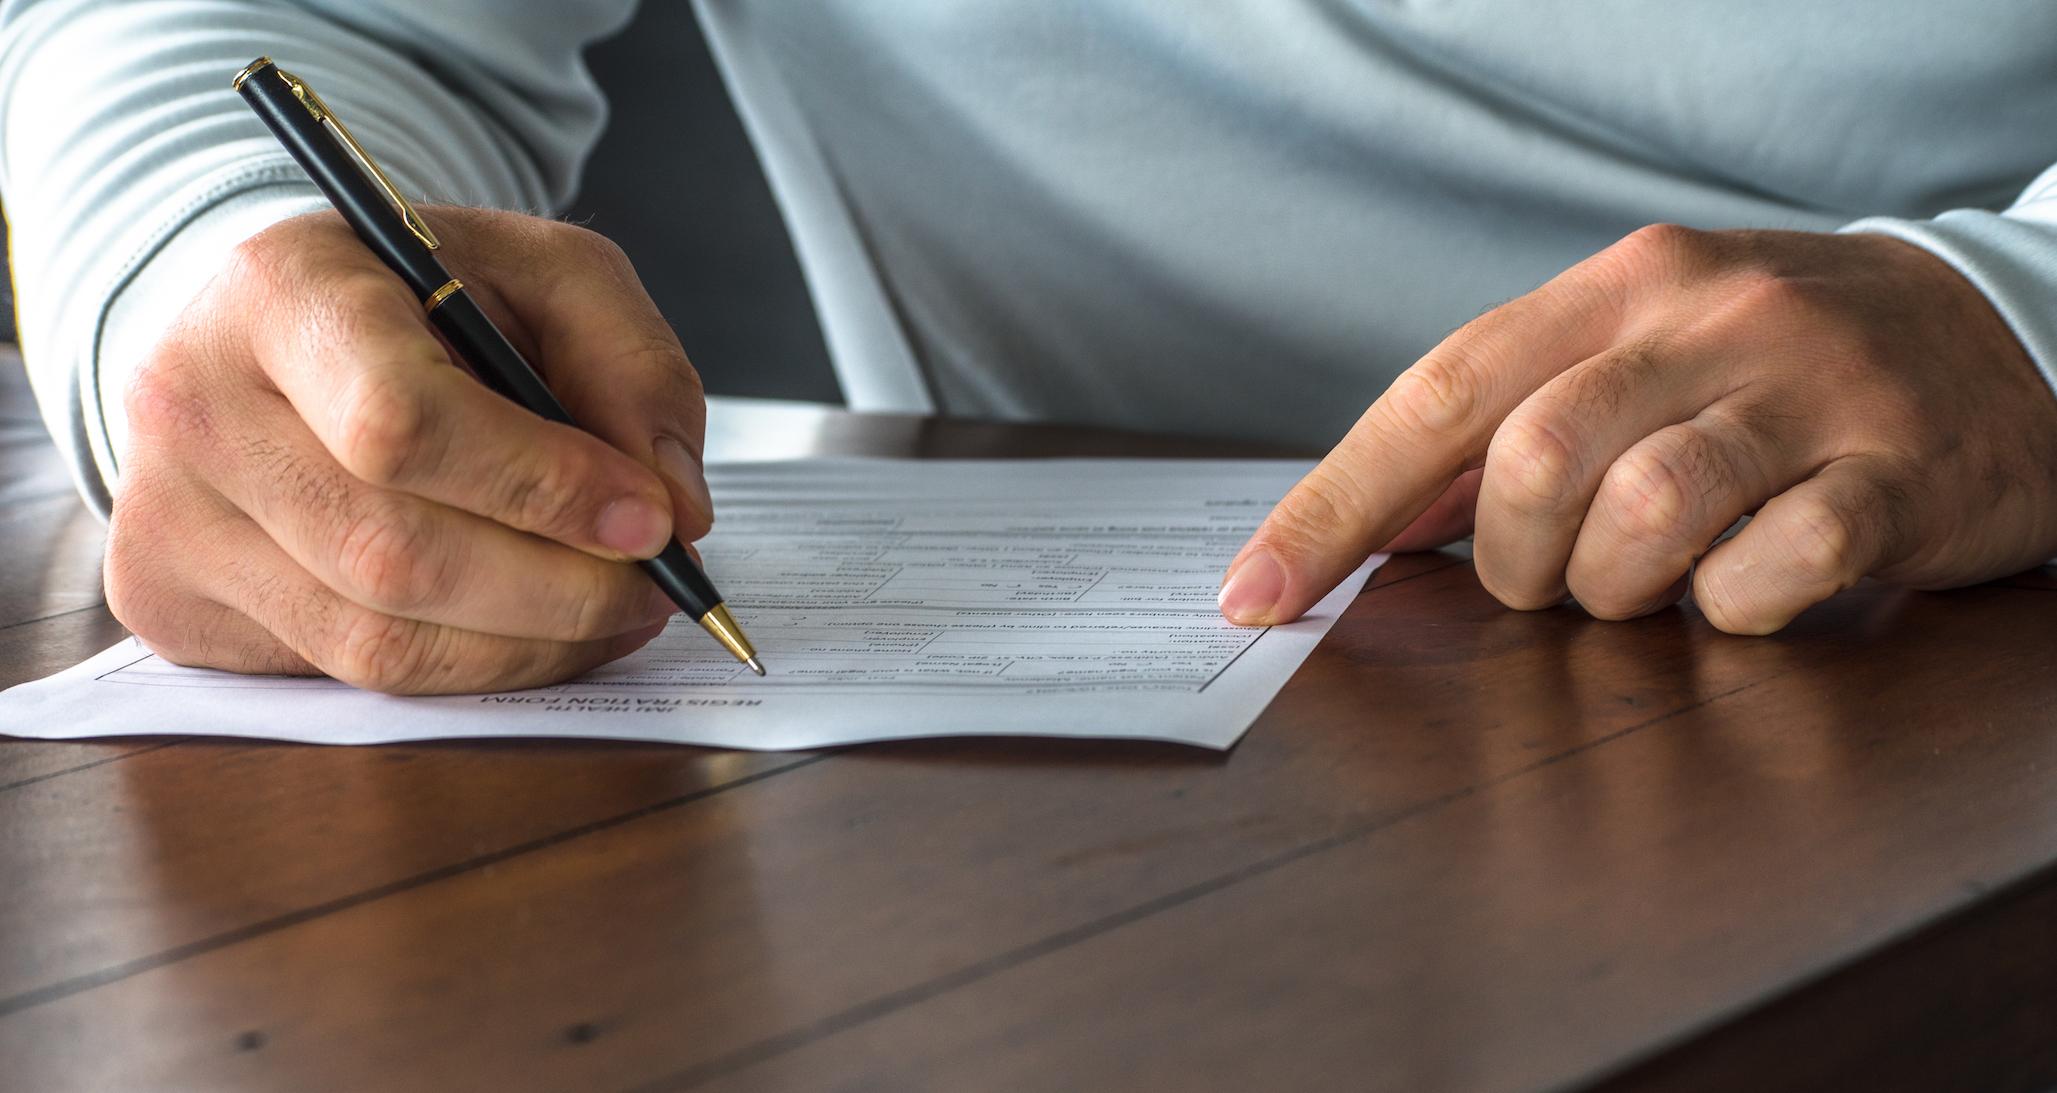 signing-document_change-voting-address.jpg